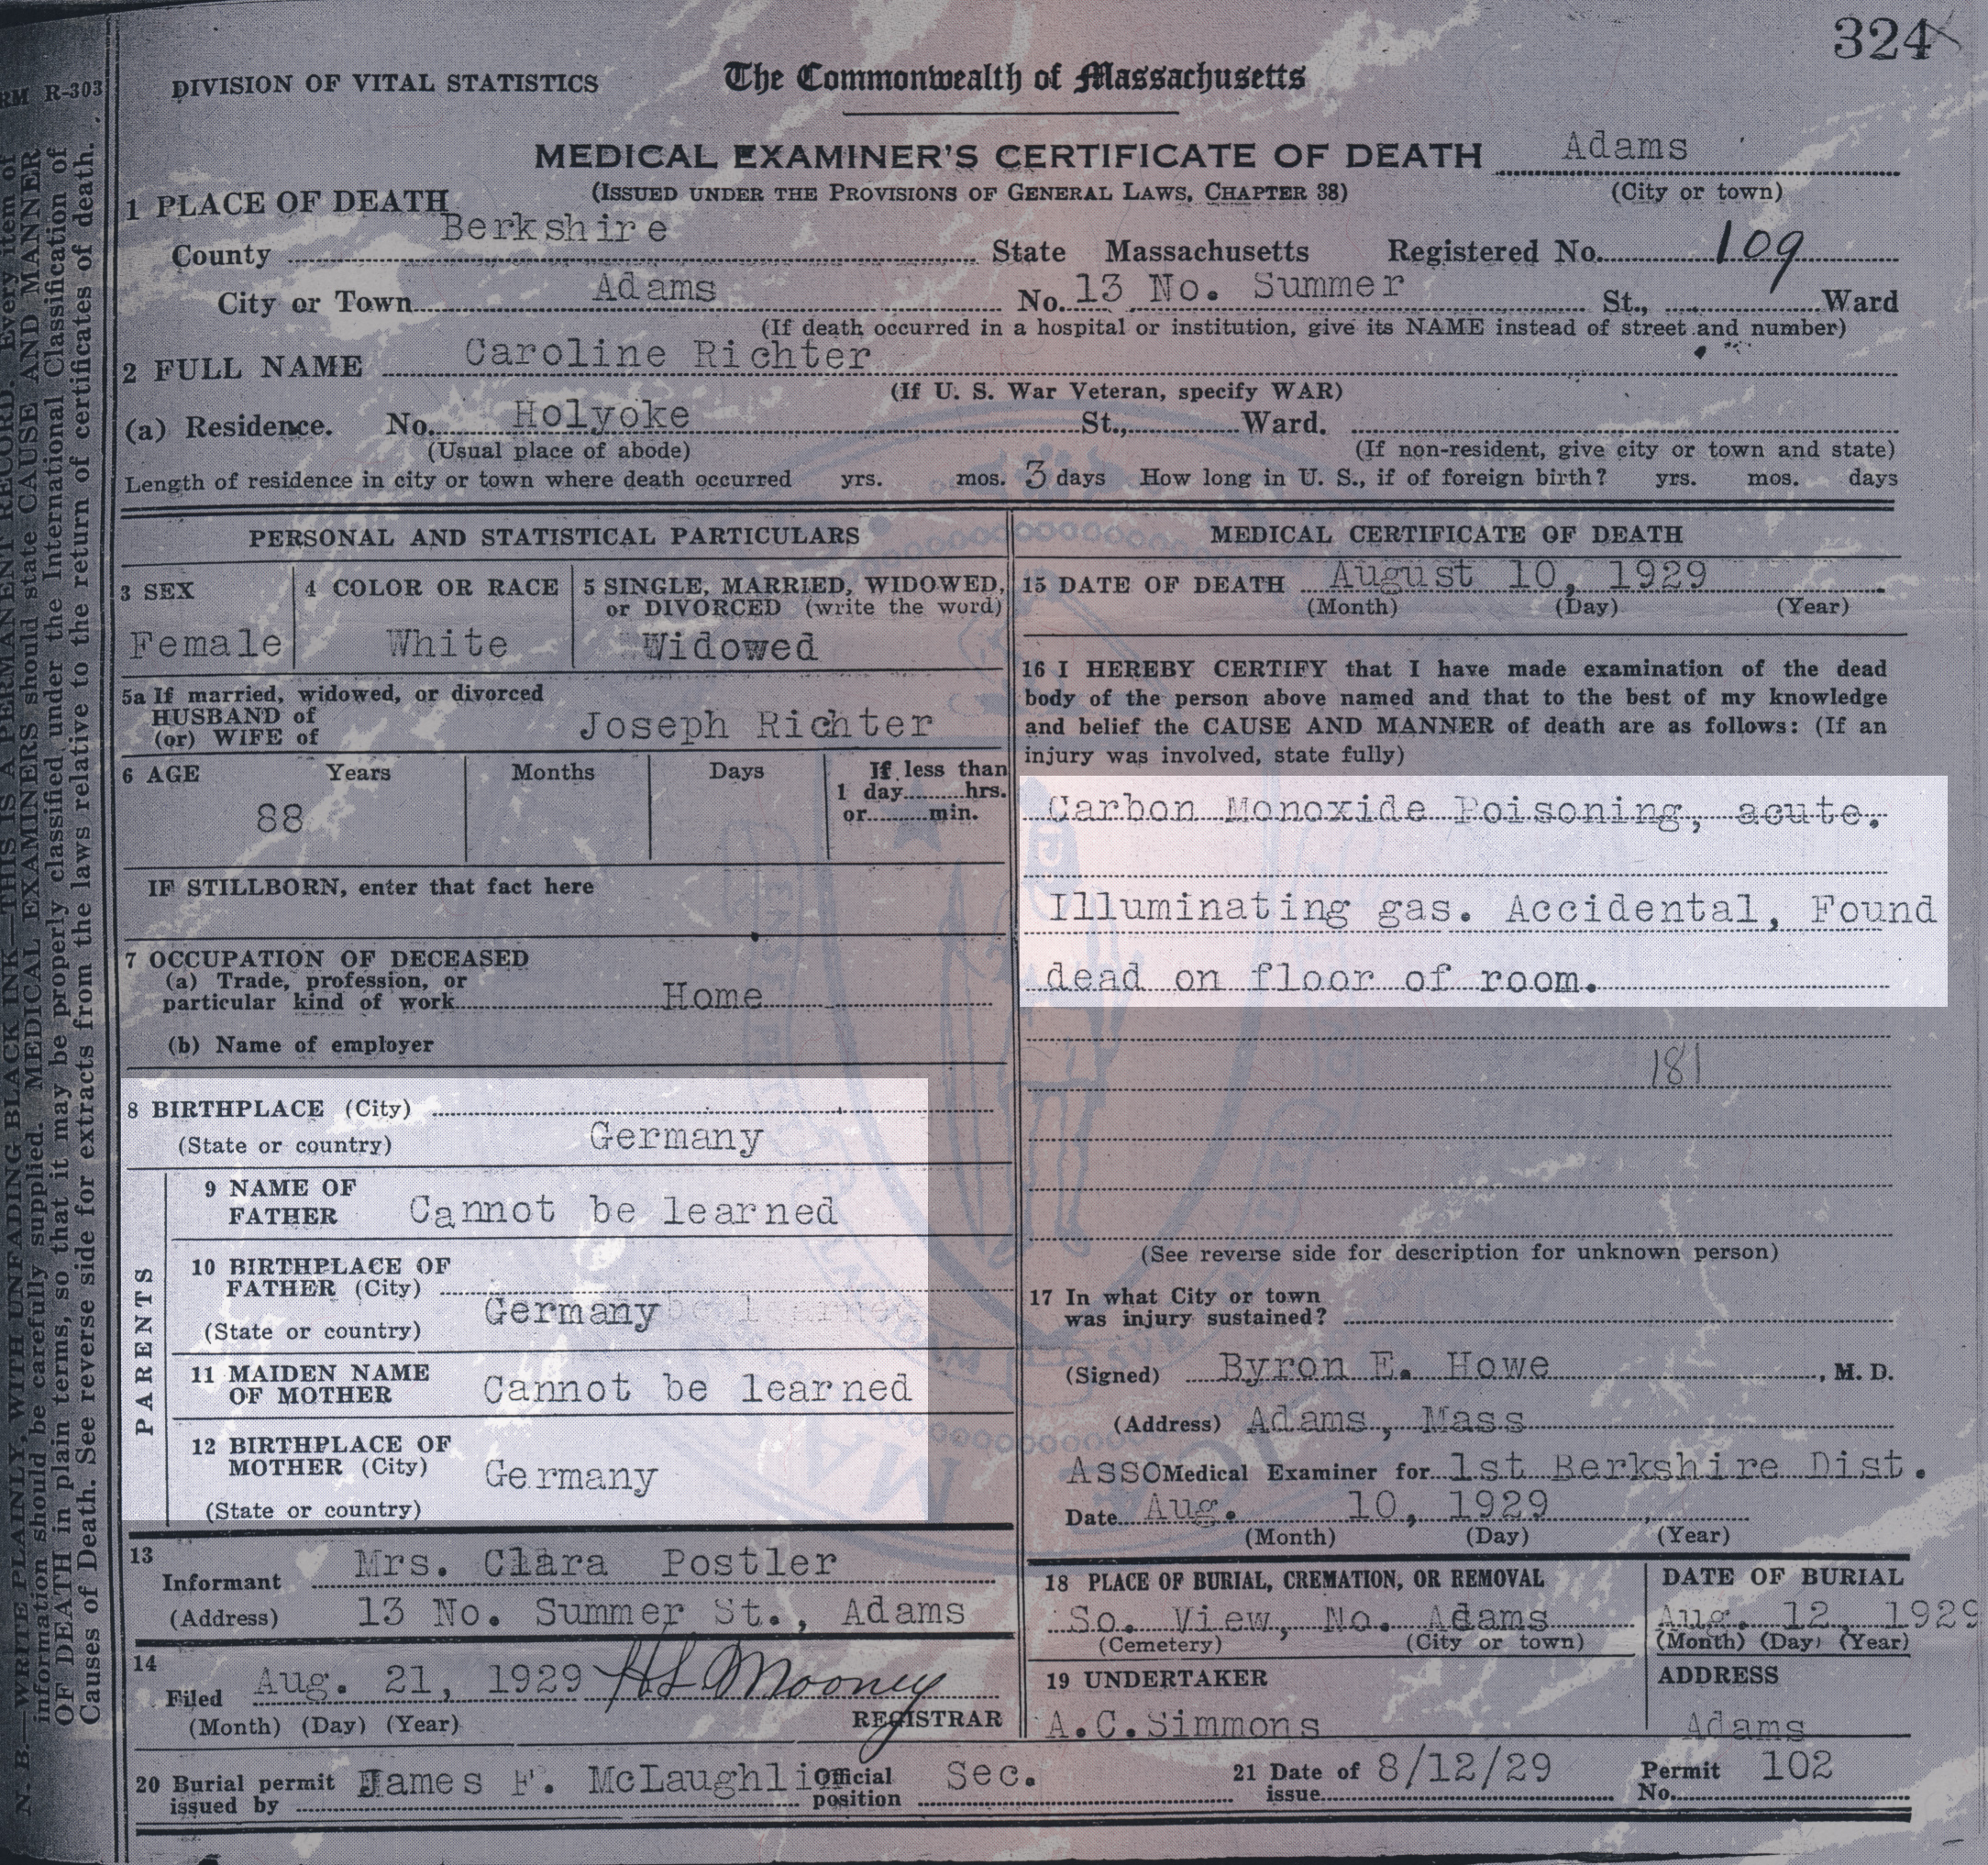 Massachusetts Death Certificate for Caroline Richter - Old